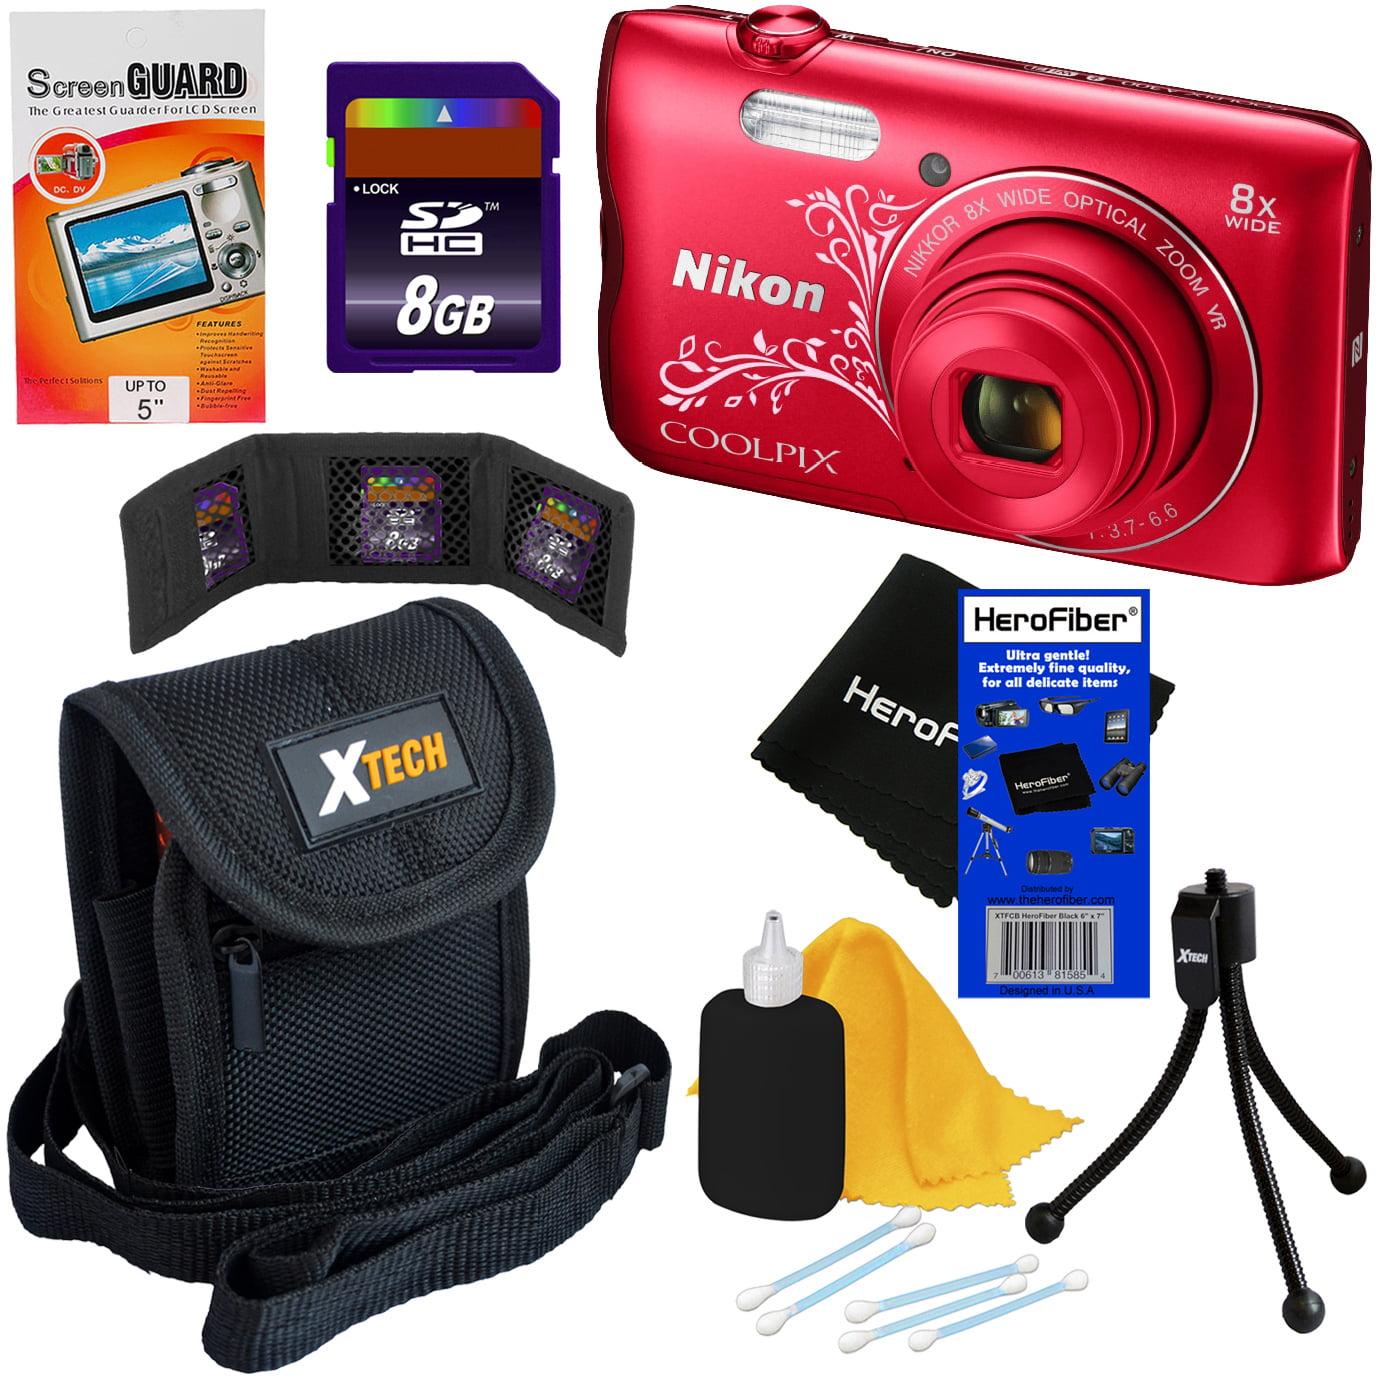 Nikon COOLPIX A300 20.1 MP Digital Camera with 8x Zoom Le...